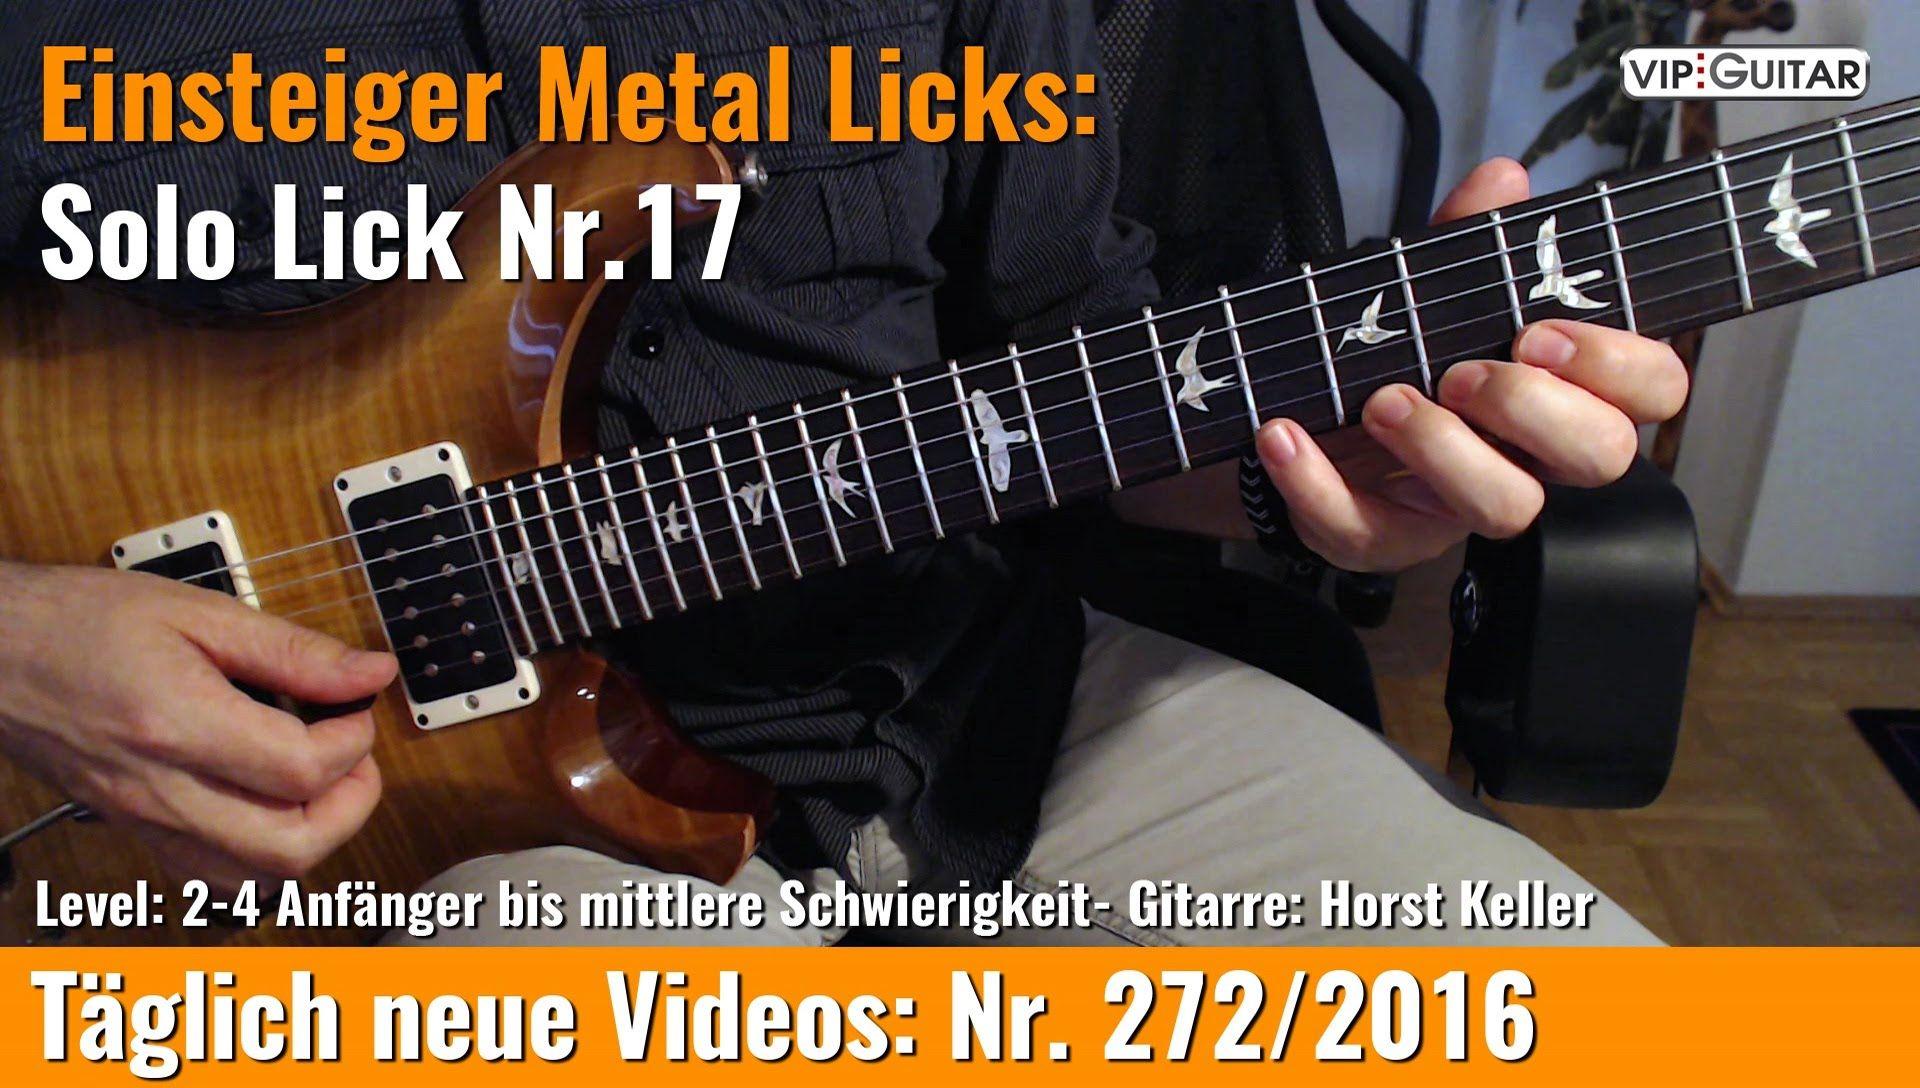 GITARRE LERNEN Pentatonik Schnelle 4 er Sequenz VIP Guitar Horst Keller Gitarre lernen